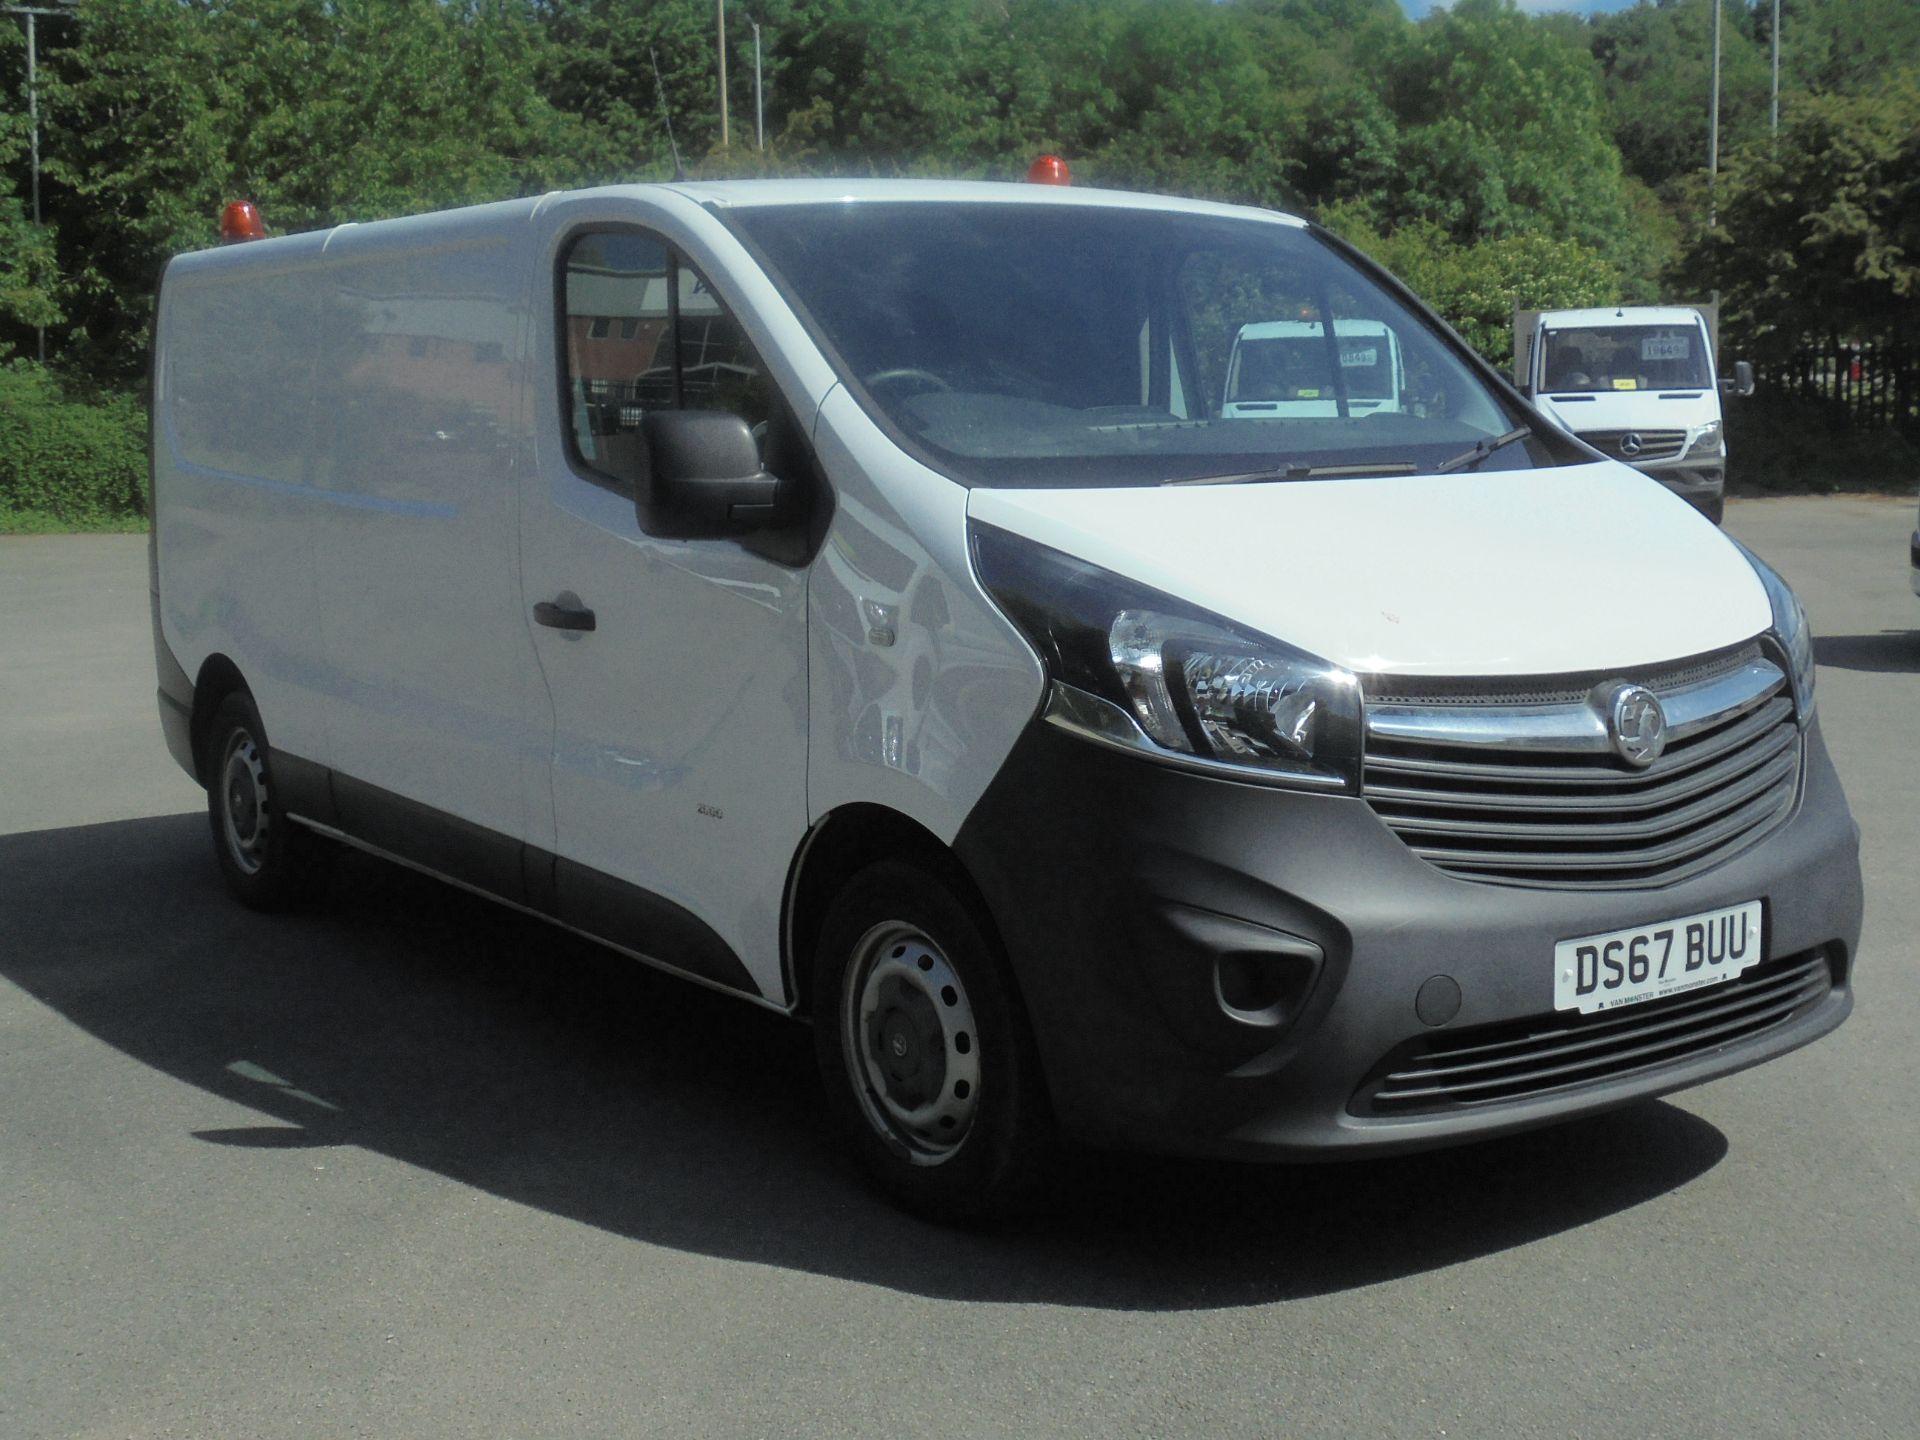 2017 Vauxhall Vivaro 2900 1.6Cdti 120Ps H1 Van (DS67BUU) Image 1